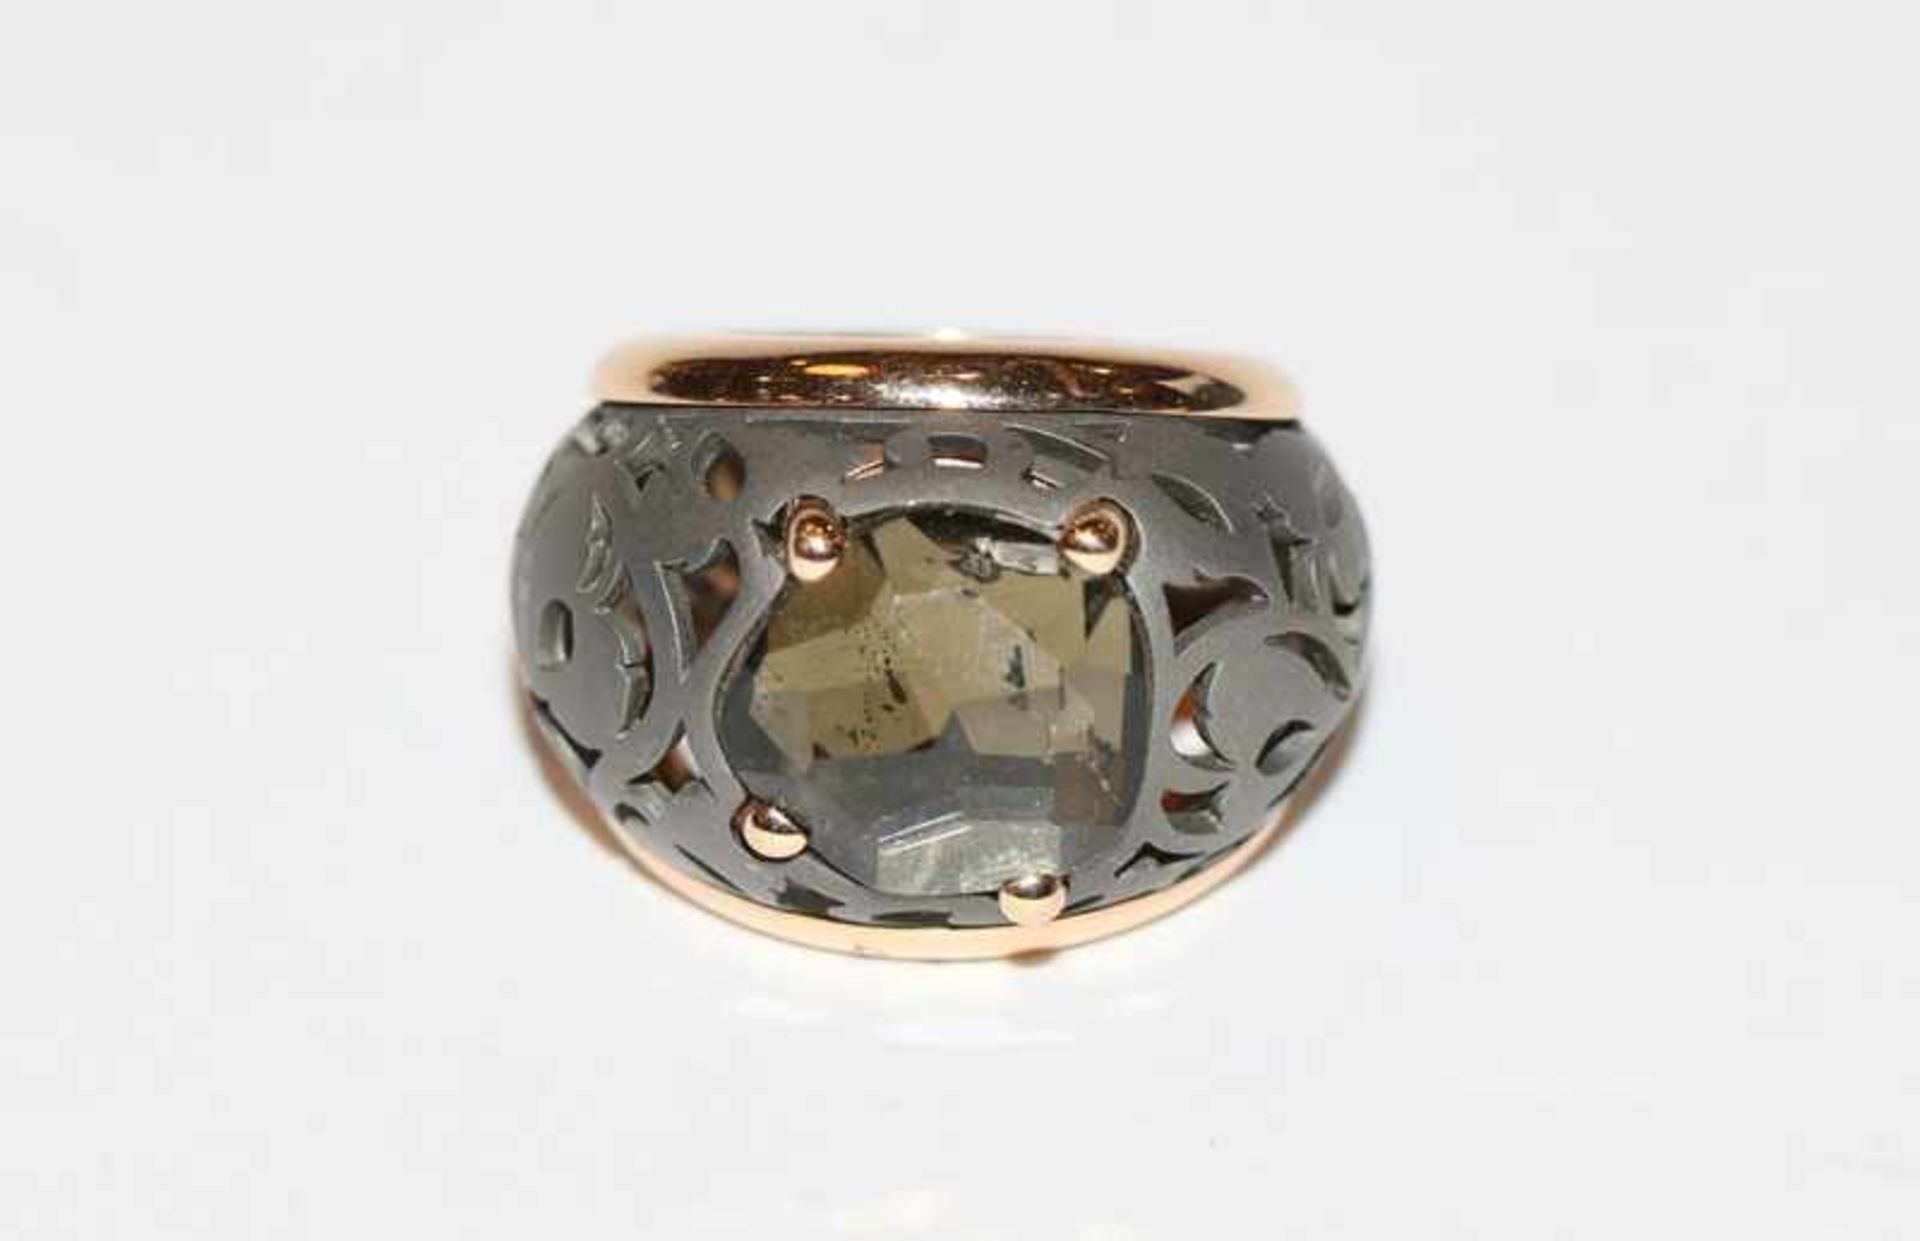 Los 79 - Titan/Roségold Ring mit Rauchtopas, Kollektion Arabesque noir, Victoria Ring, Gr. 55